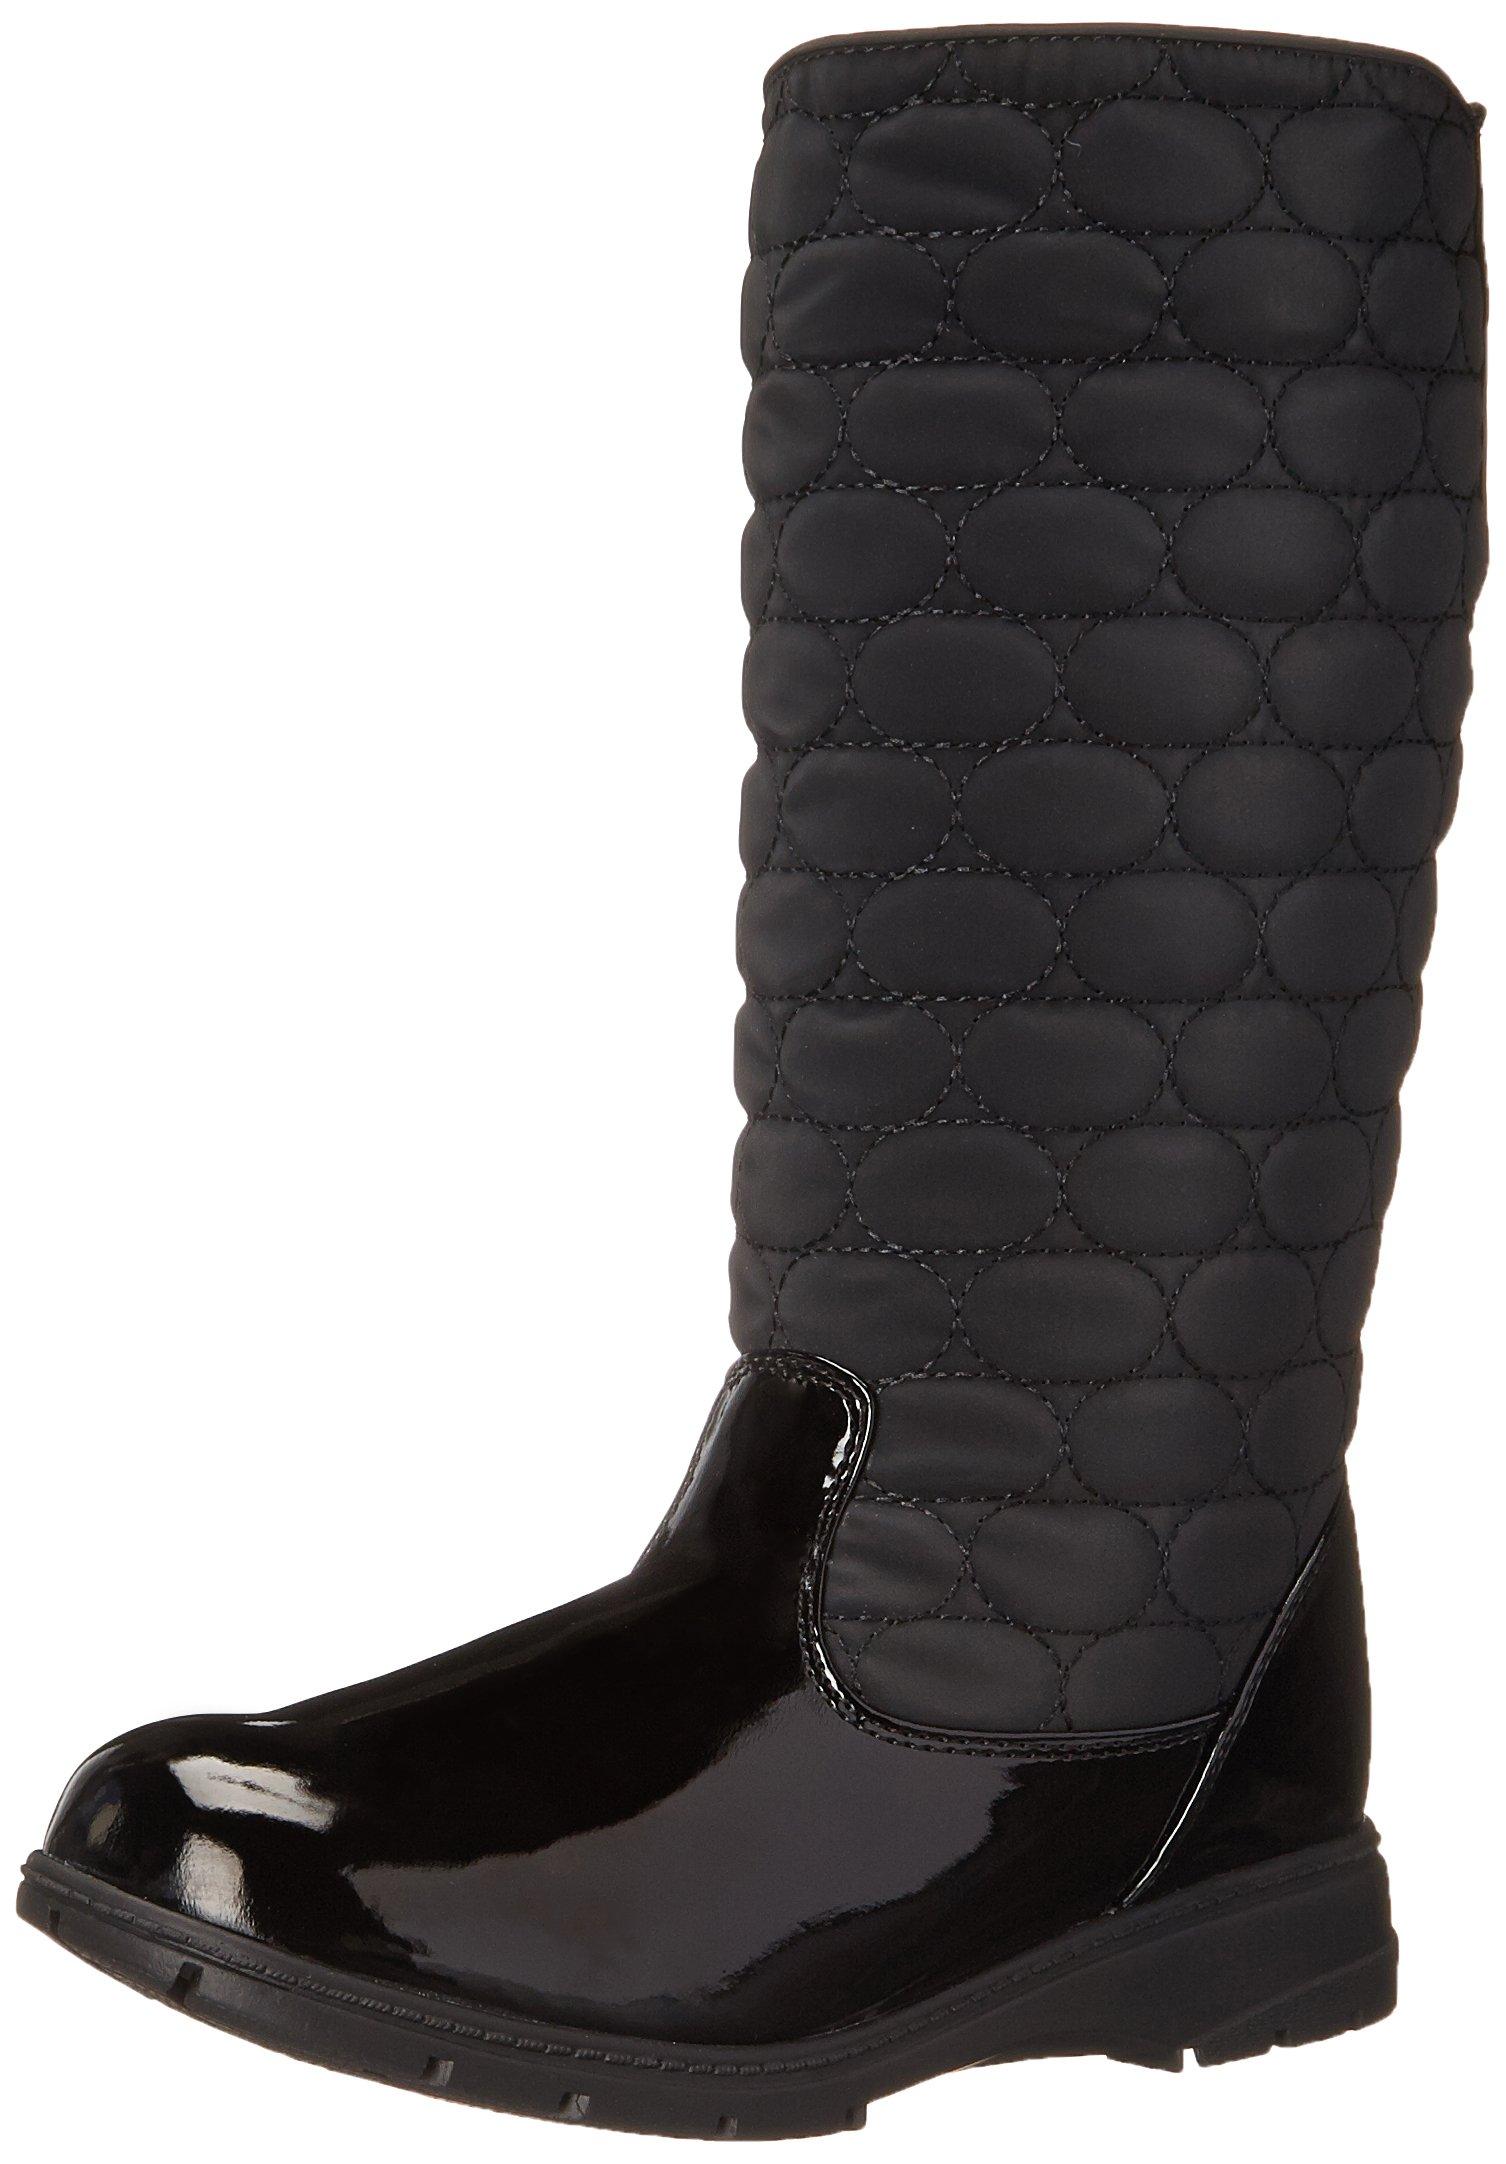 Soft Style by Hush Puppies Women's Paris Boot, Black Vylon/Patent, 8 M US